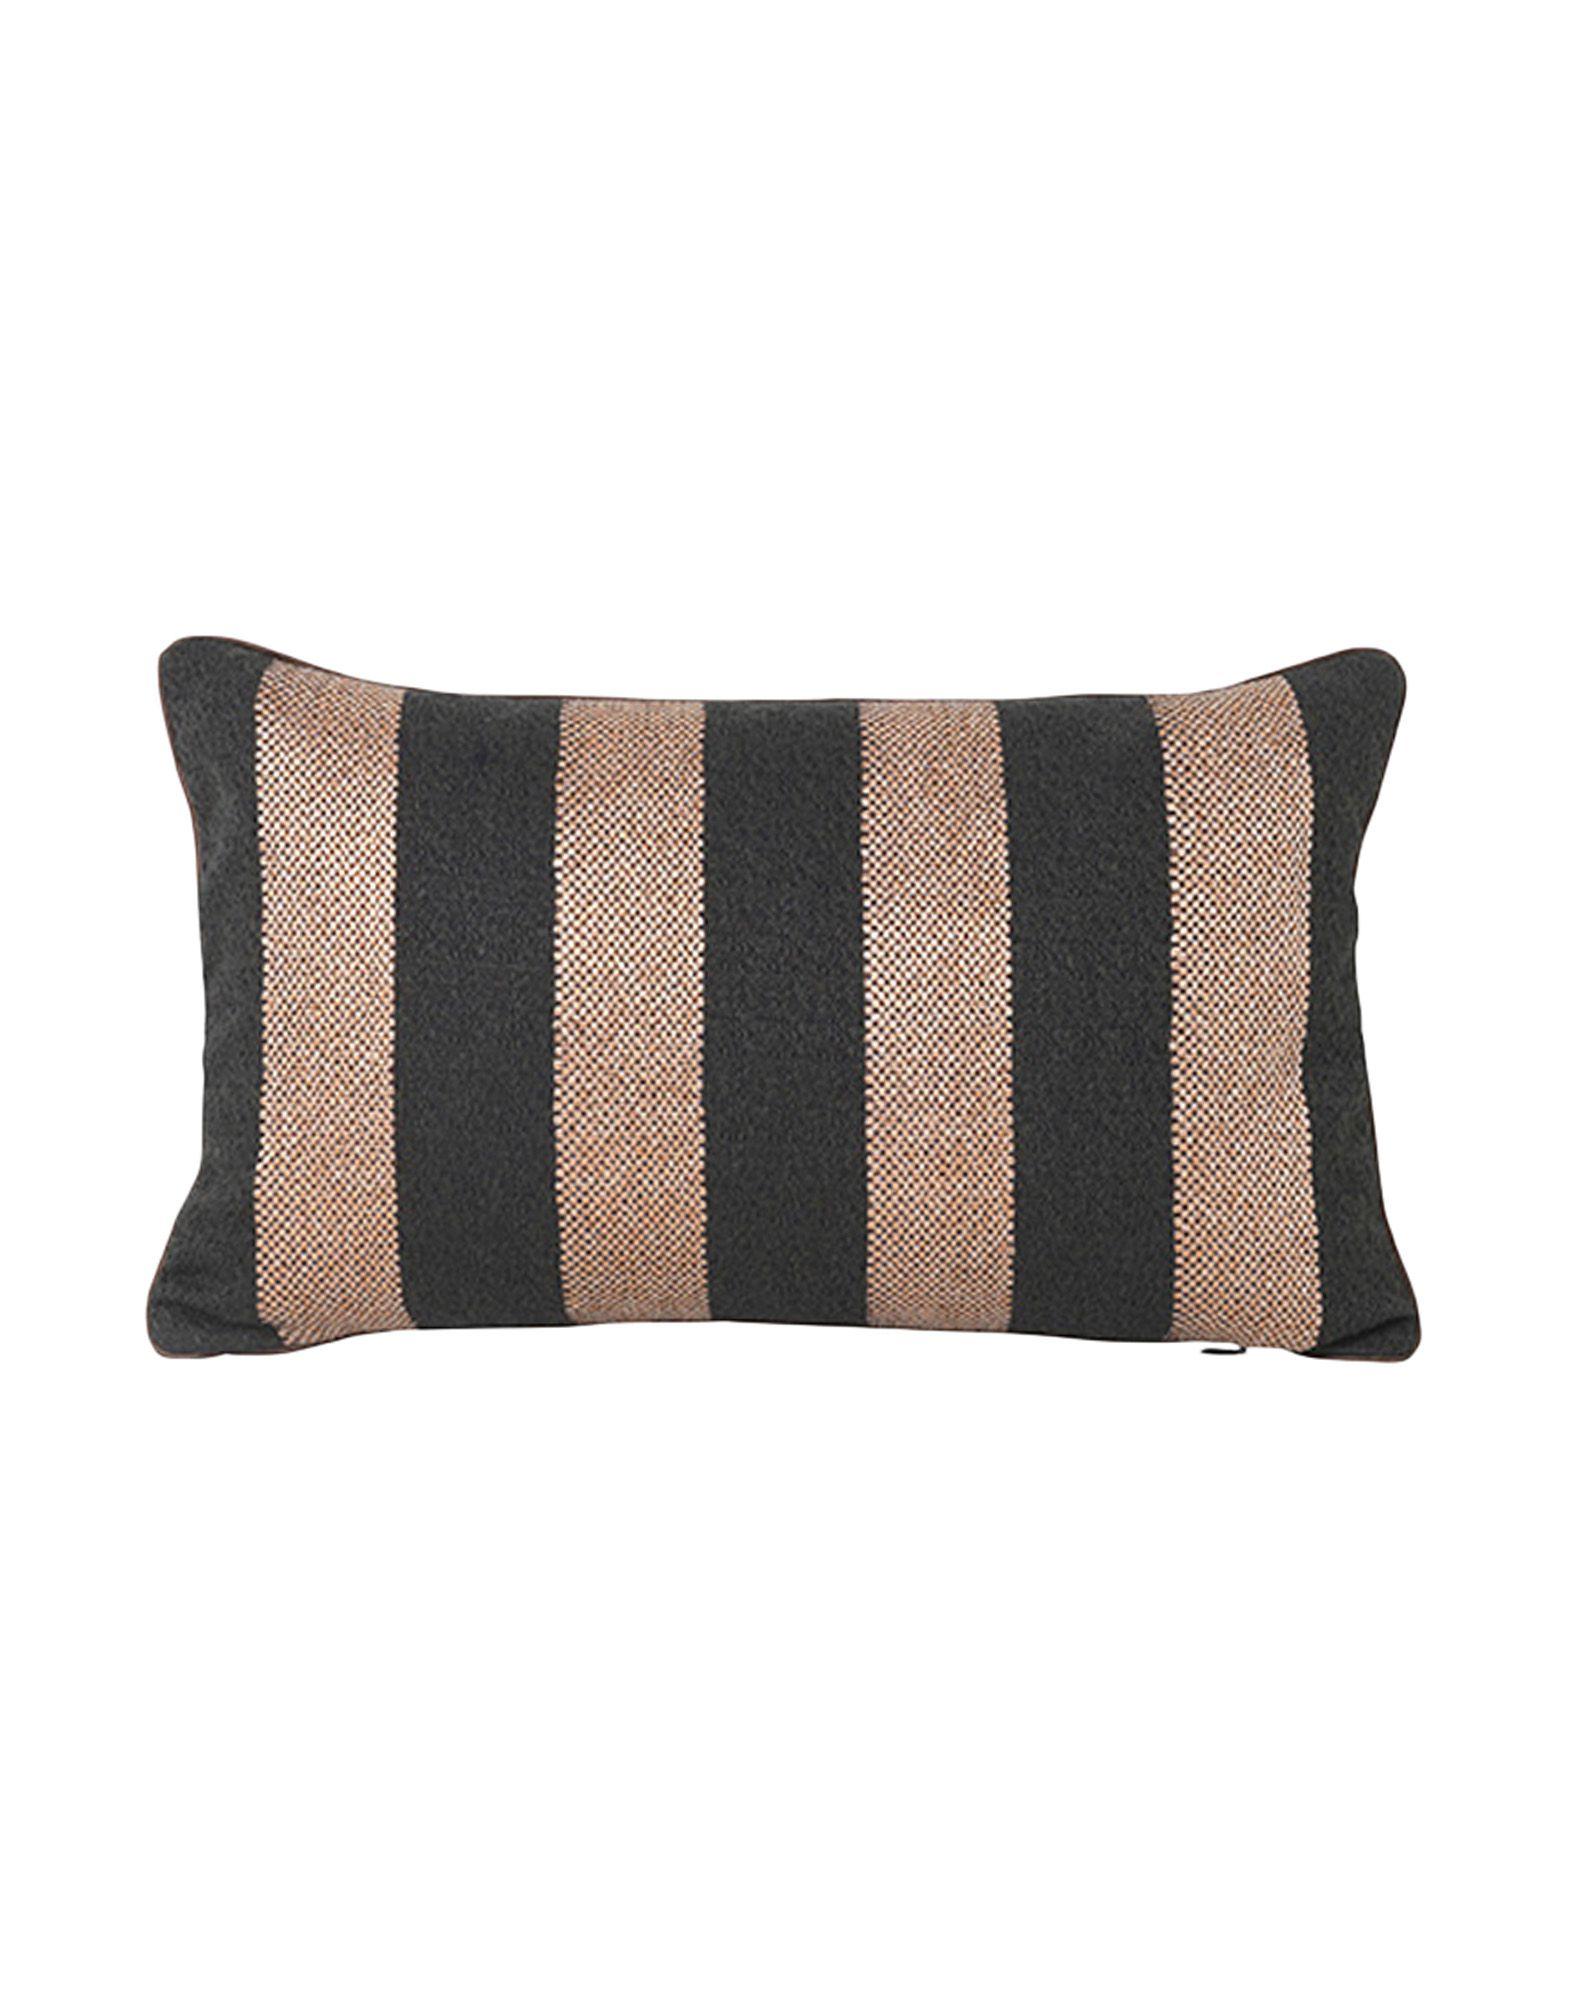 Charmant FERM LIVING Pillows   Home Accessories | YOOX.COM